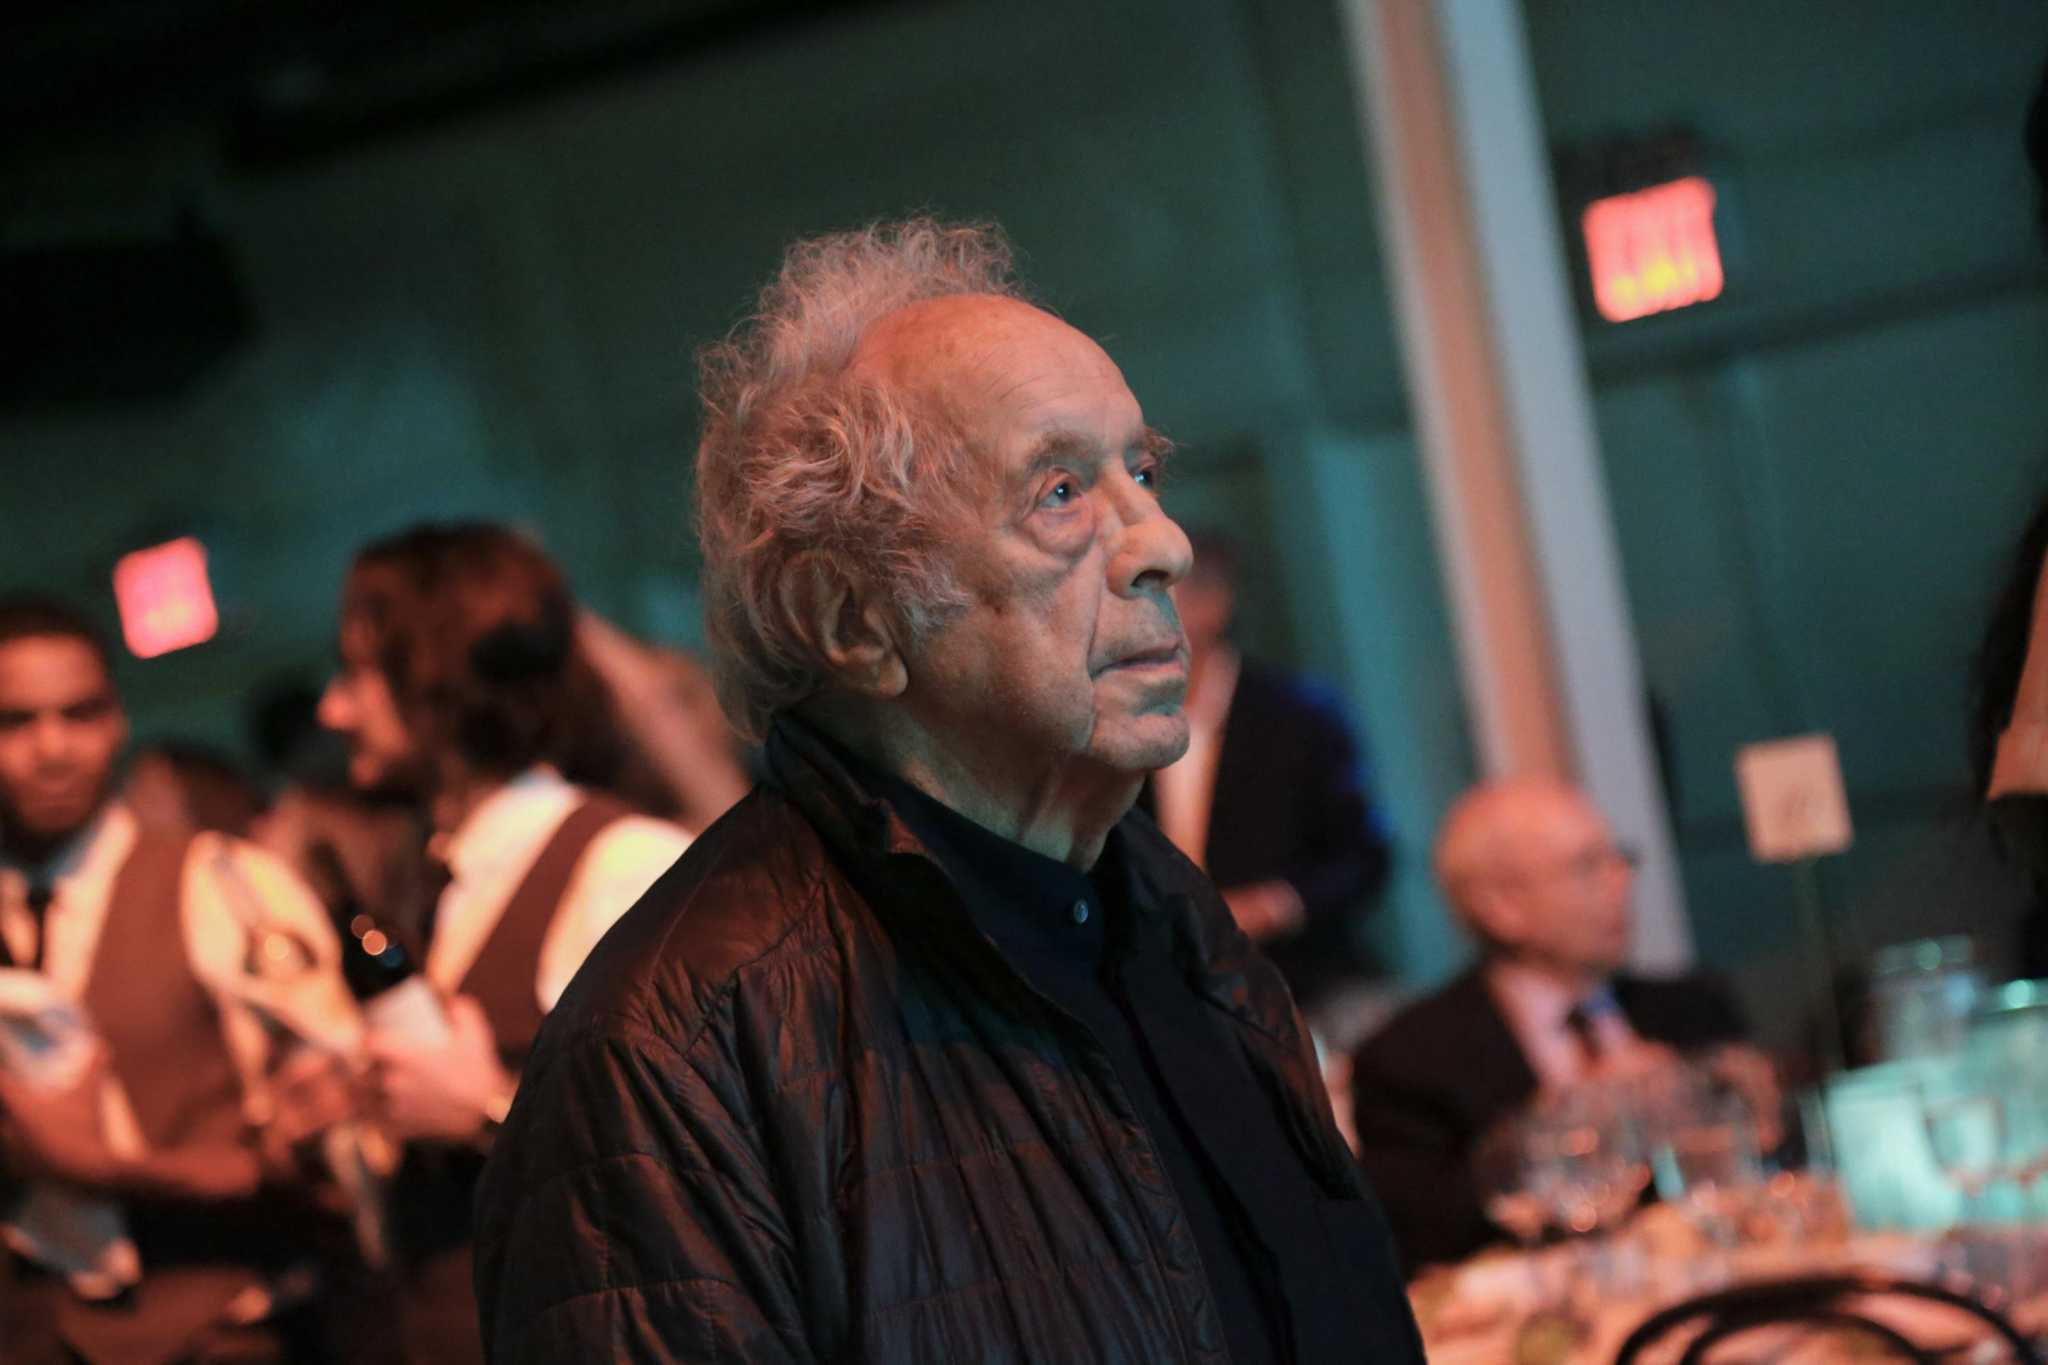 MFAH retrospective honors photographer Robert Frank